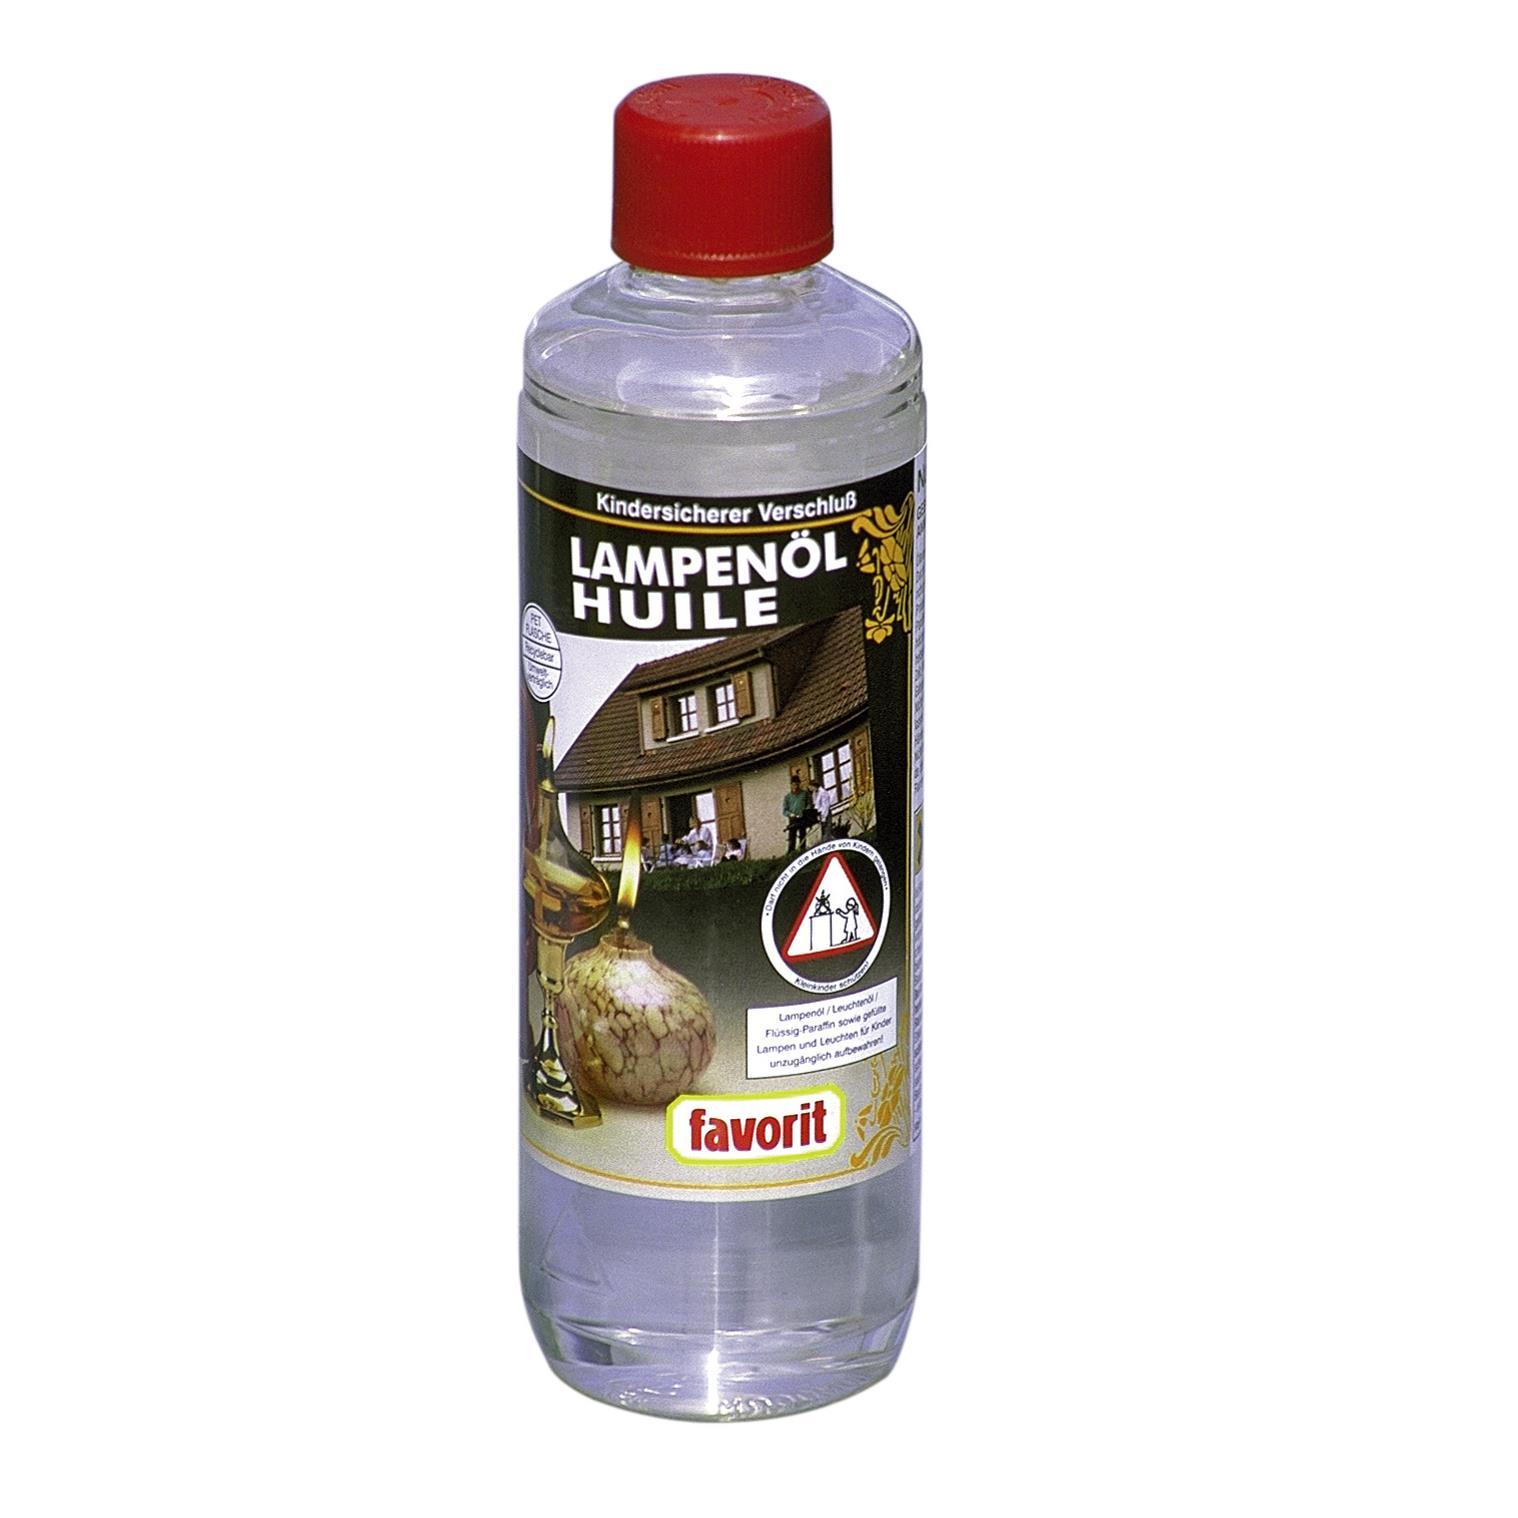 Relags Lampenöl, 1 Liter